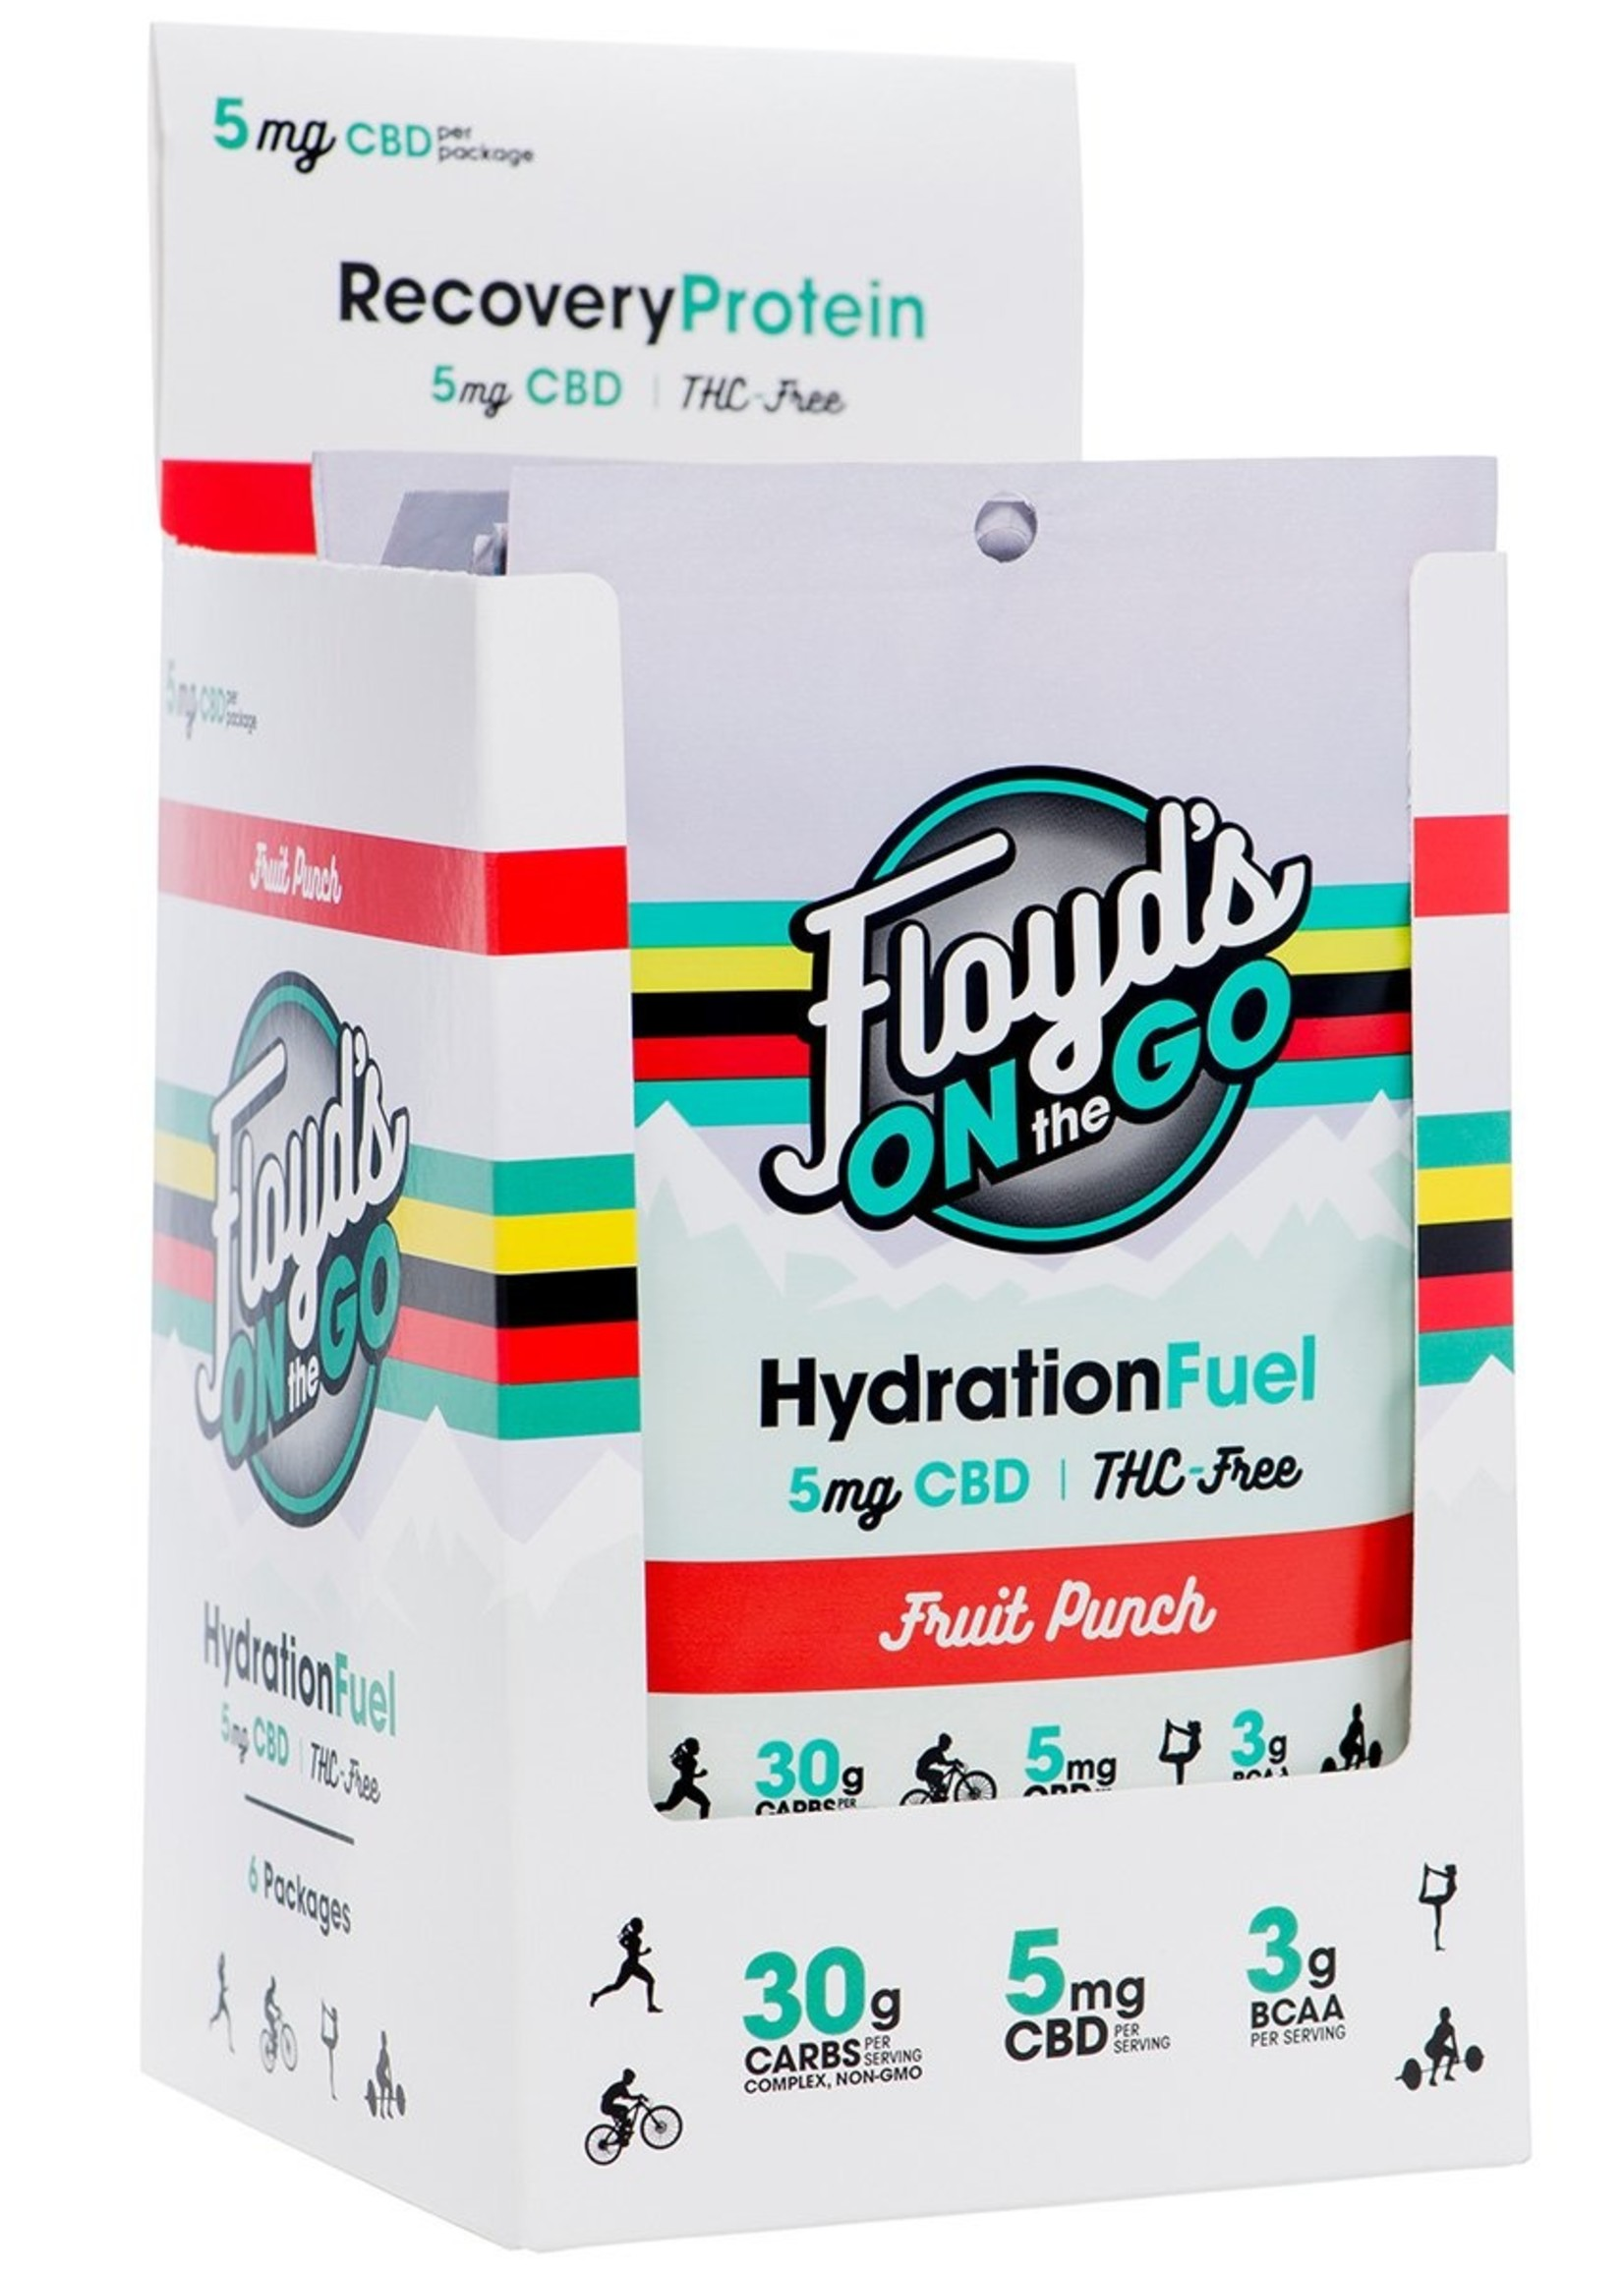 Floyds of Leadville Floyd's of Leadville Fruit Punch Hydration